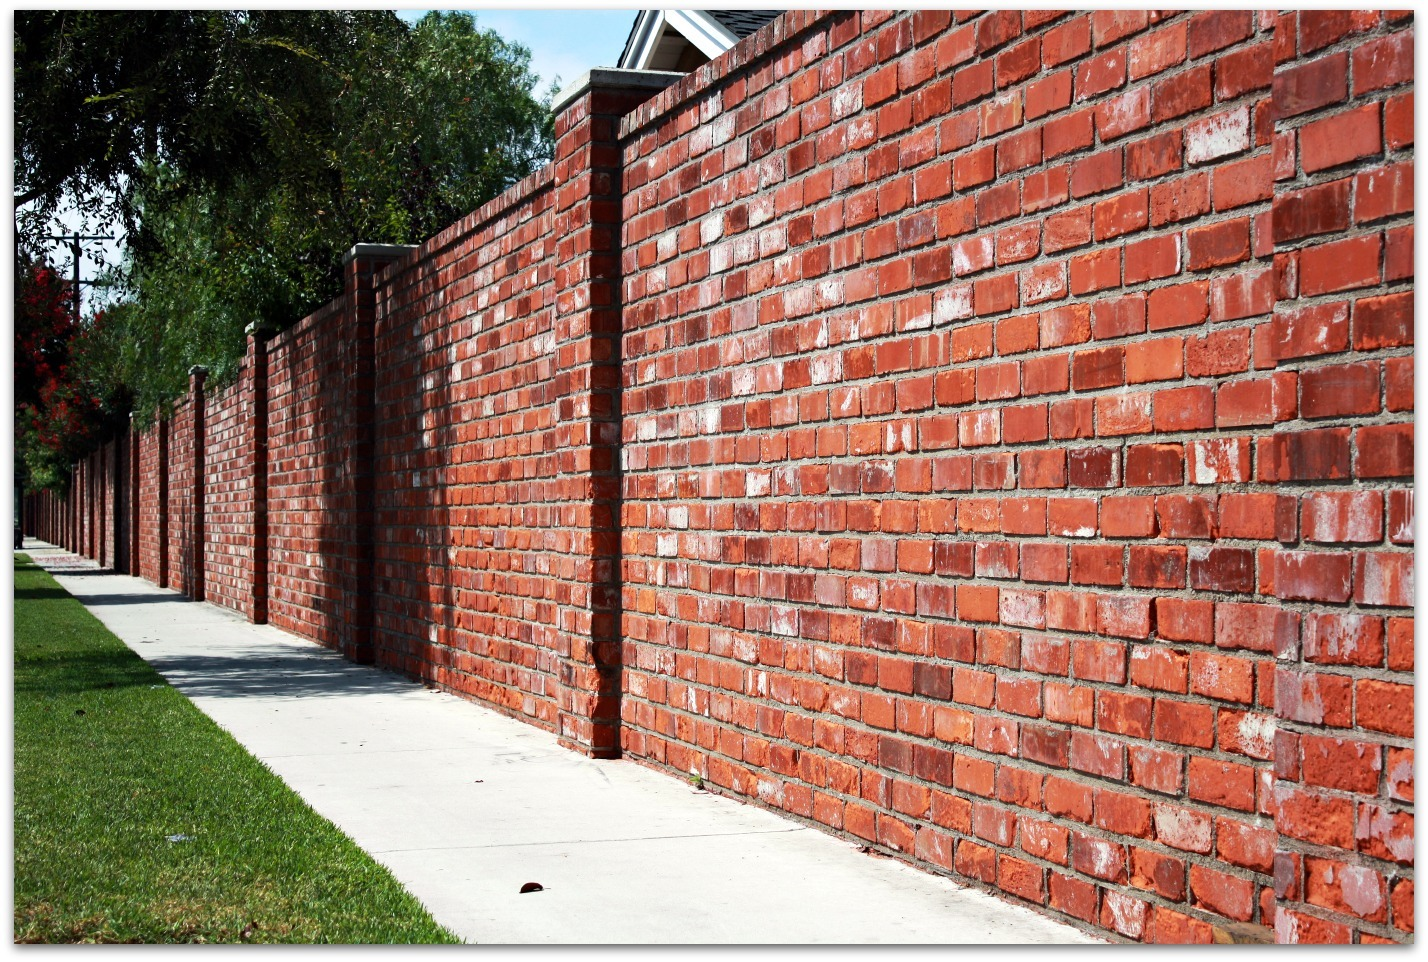 стена дома из кирпича картинки этом сама